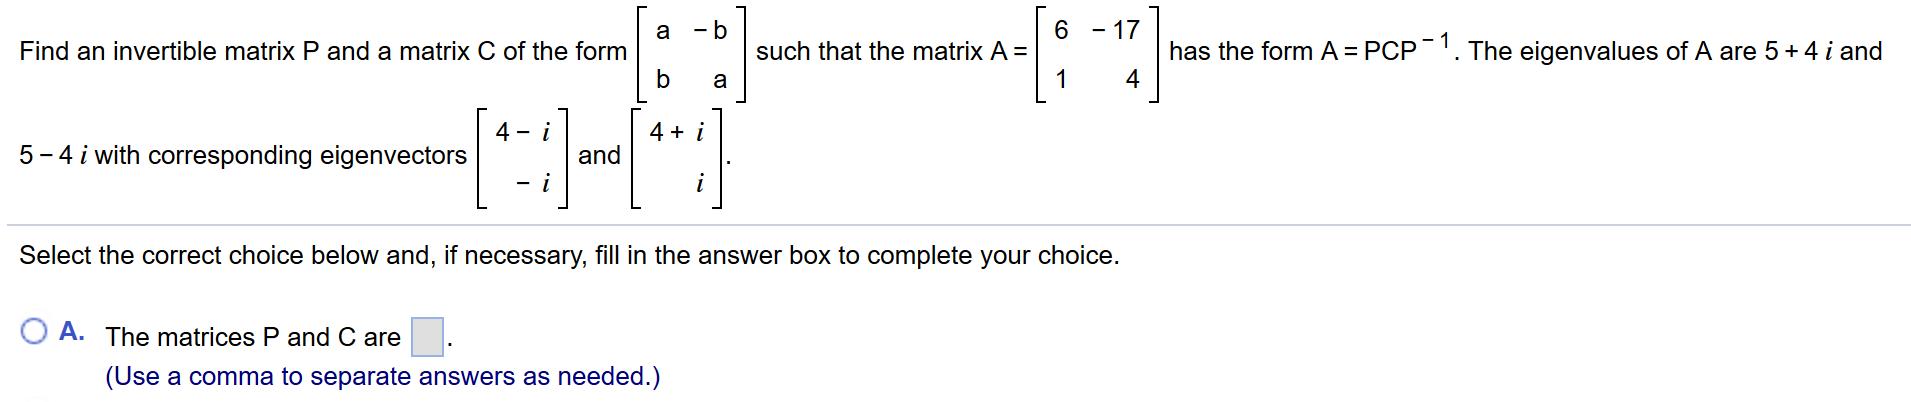 Find An Invertible Matrix P And A Matrix C Of The ... | Chegg.com